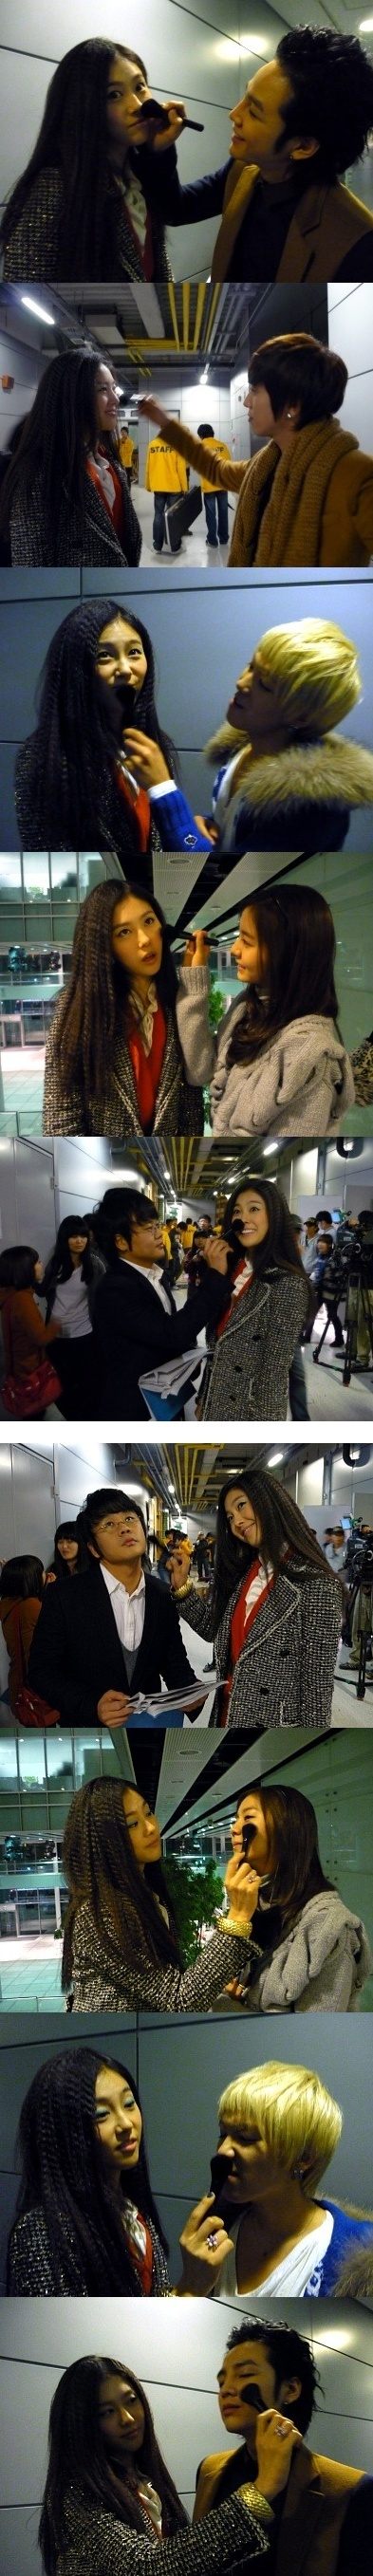 Your beautiful سریل کره ای :تو زیبایی 1